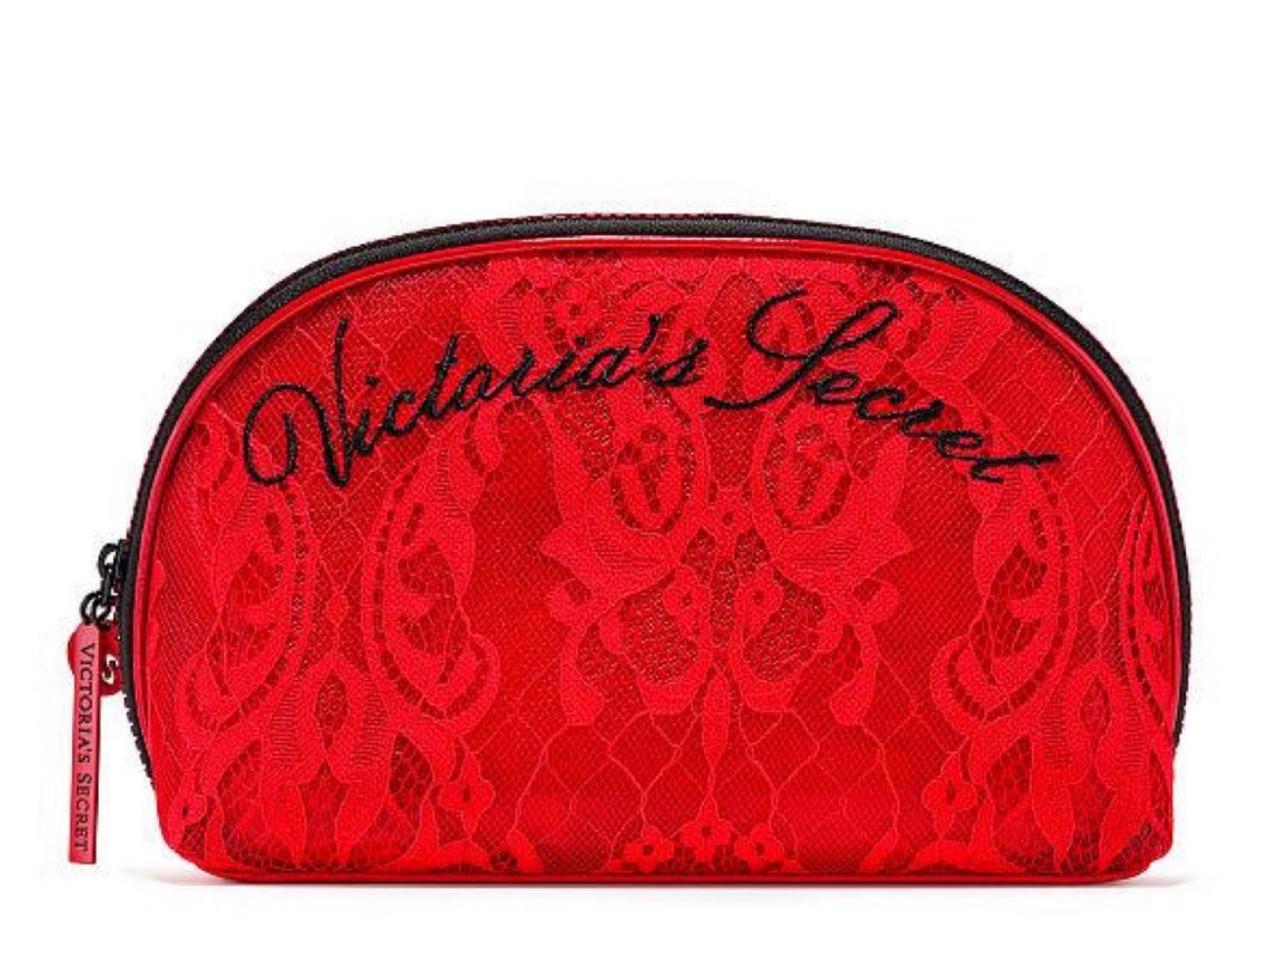 Victoria's Secret Косметичка Bold Floral Beauty Bag, Красная с цветами